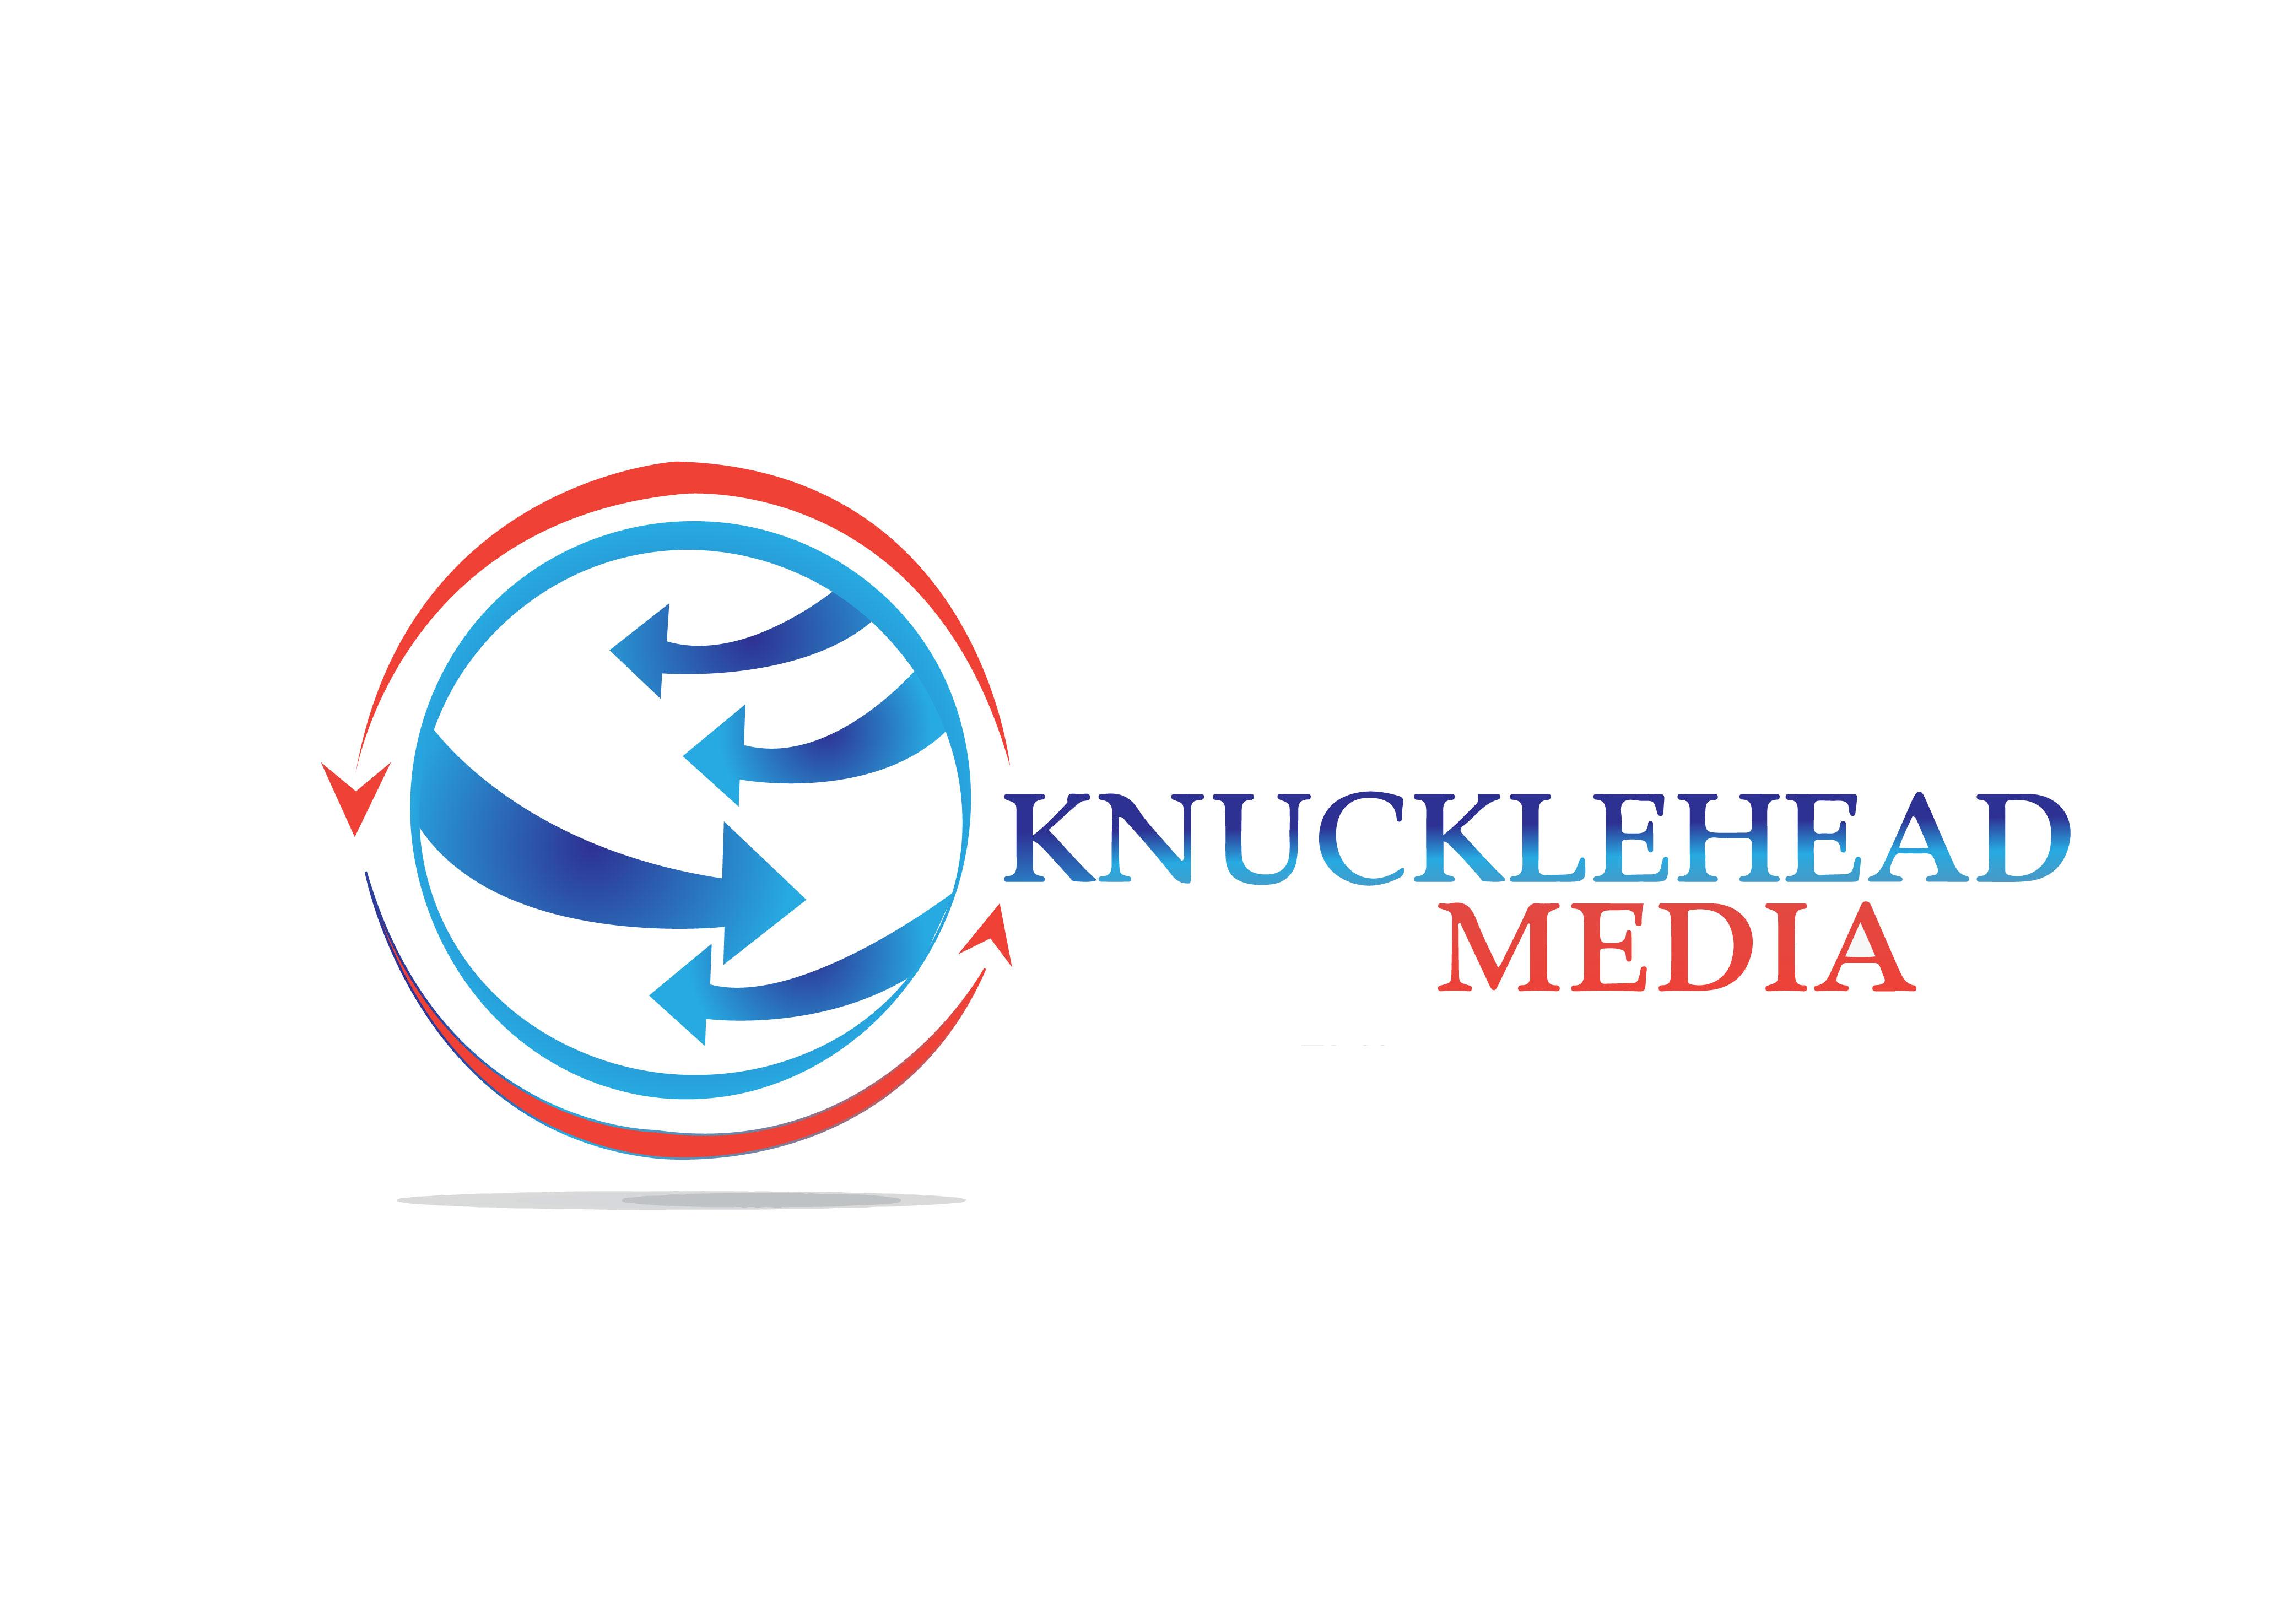 Logo Design by Bilal Baloch - Entry No. 78 in the Logo Design Contest Imaginative Logo Design for knucklehead media.